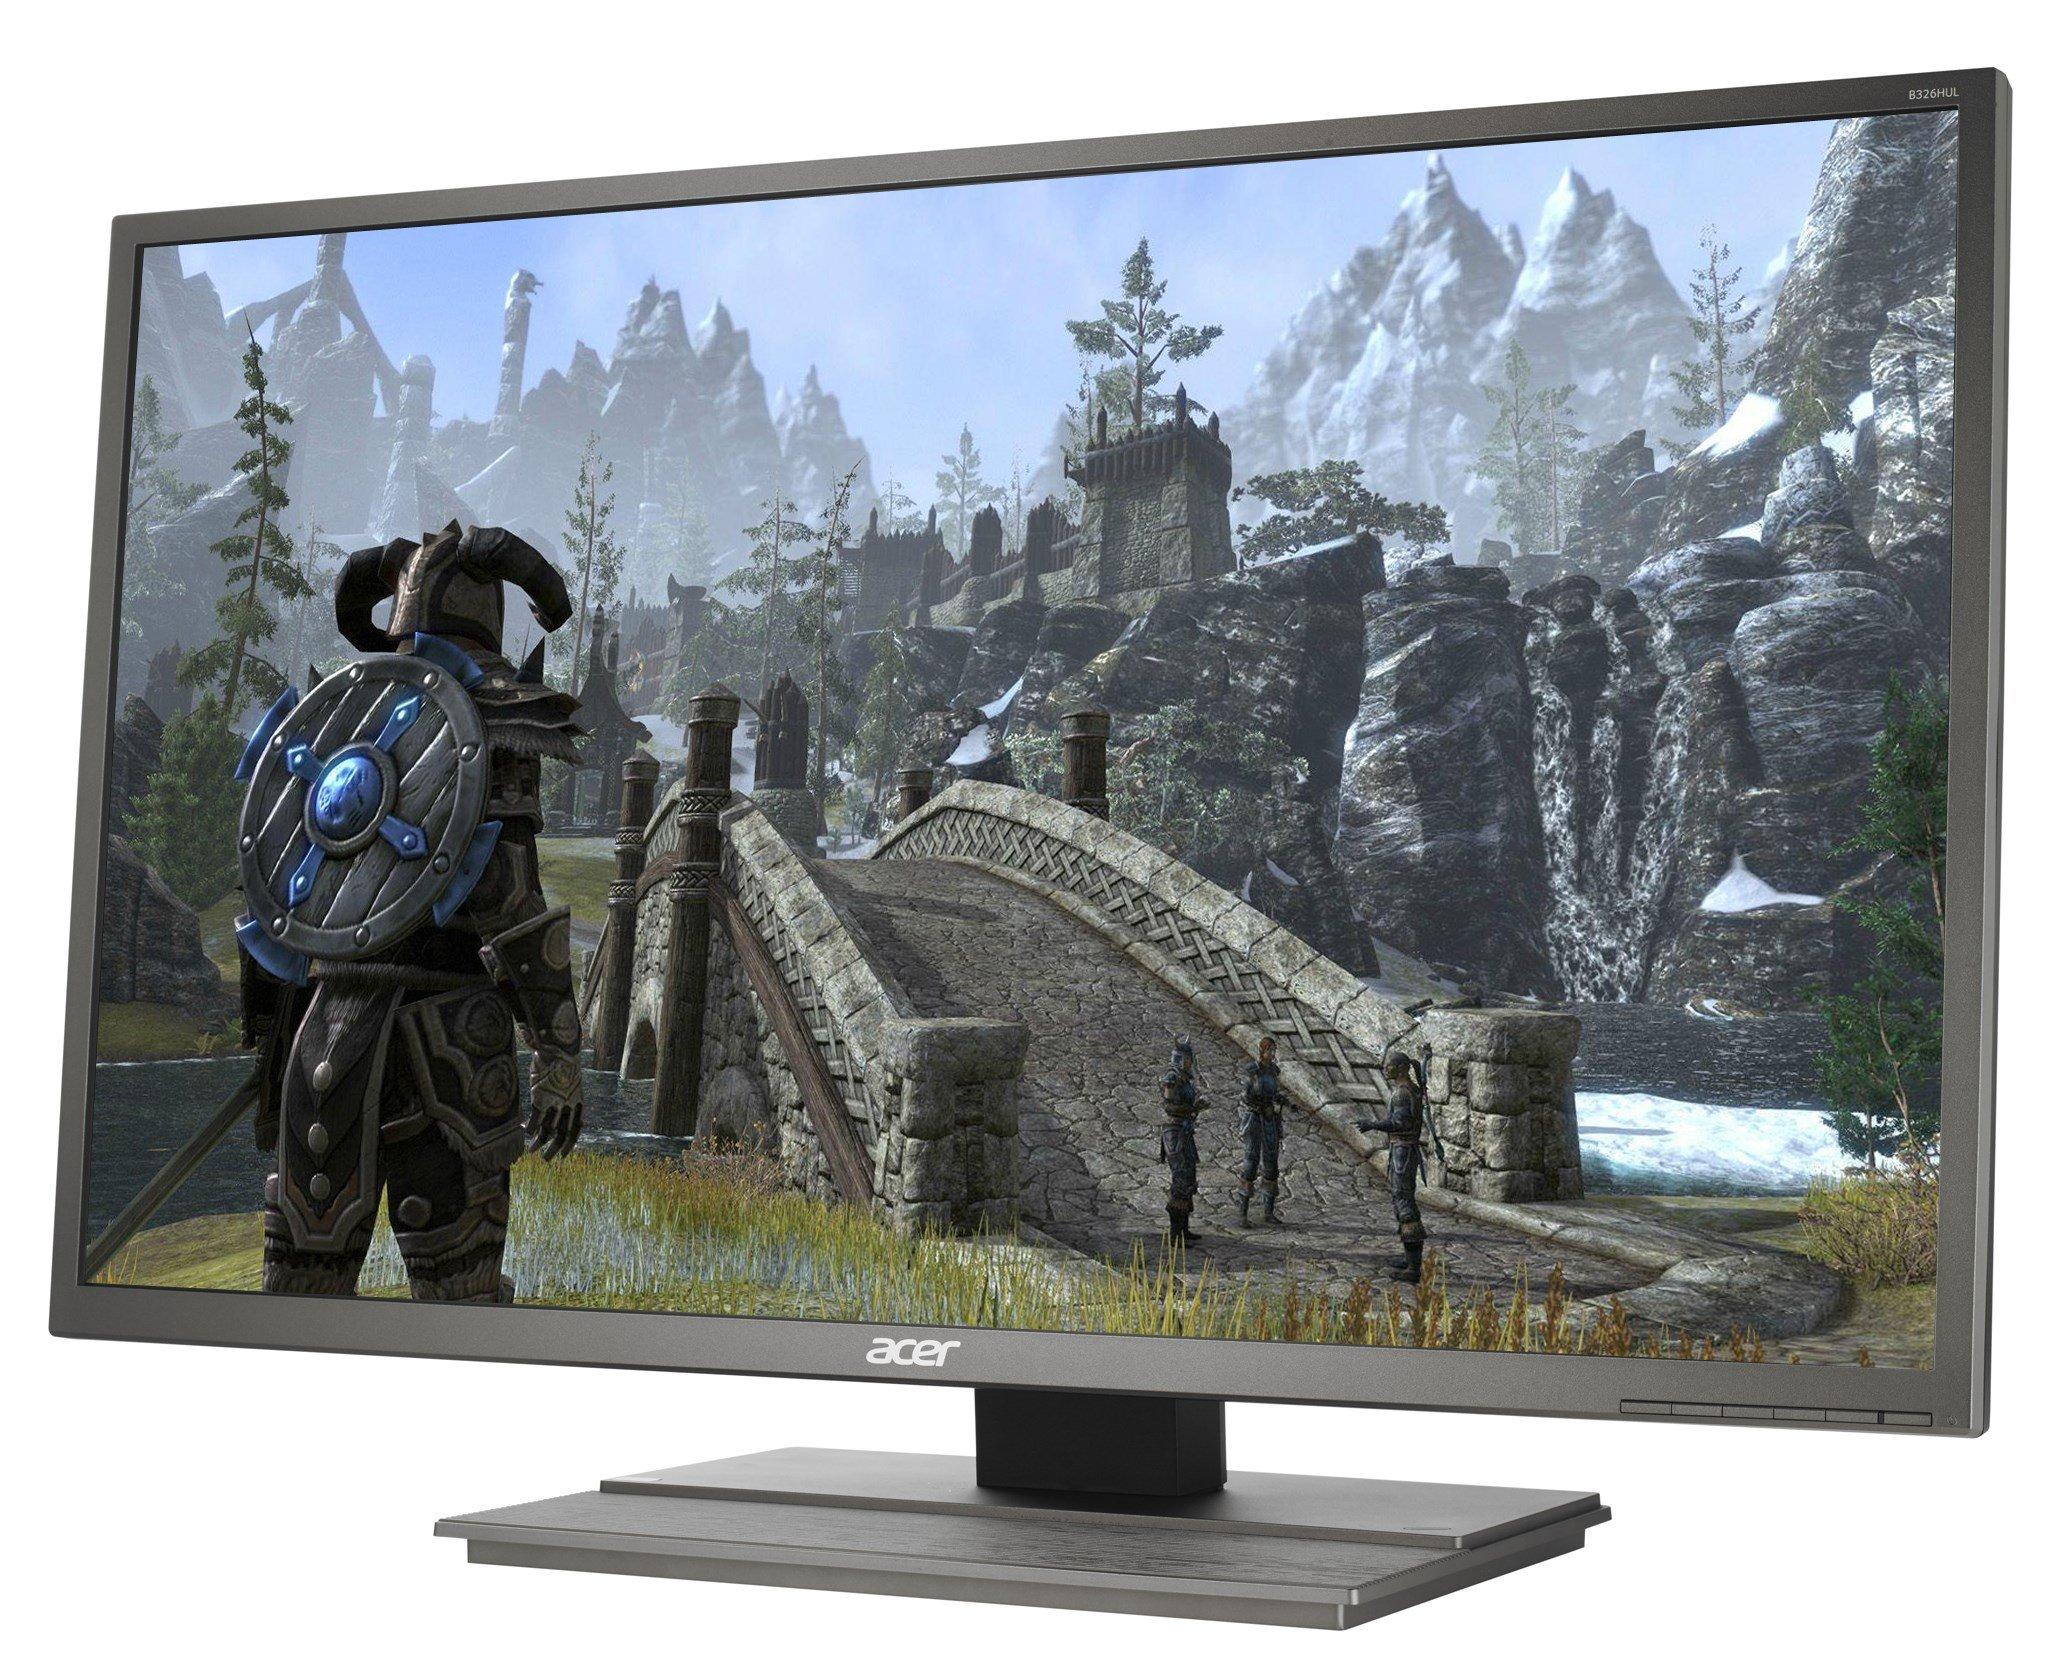 Acer B326HUL Monitor Display Windows